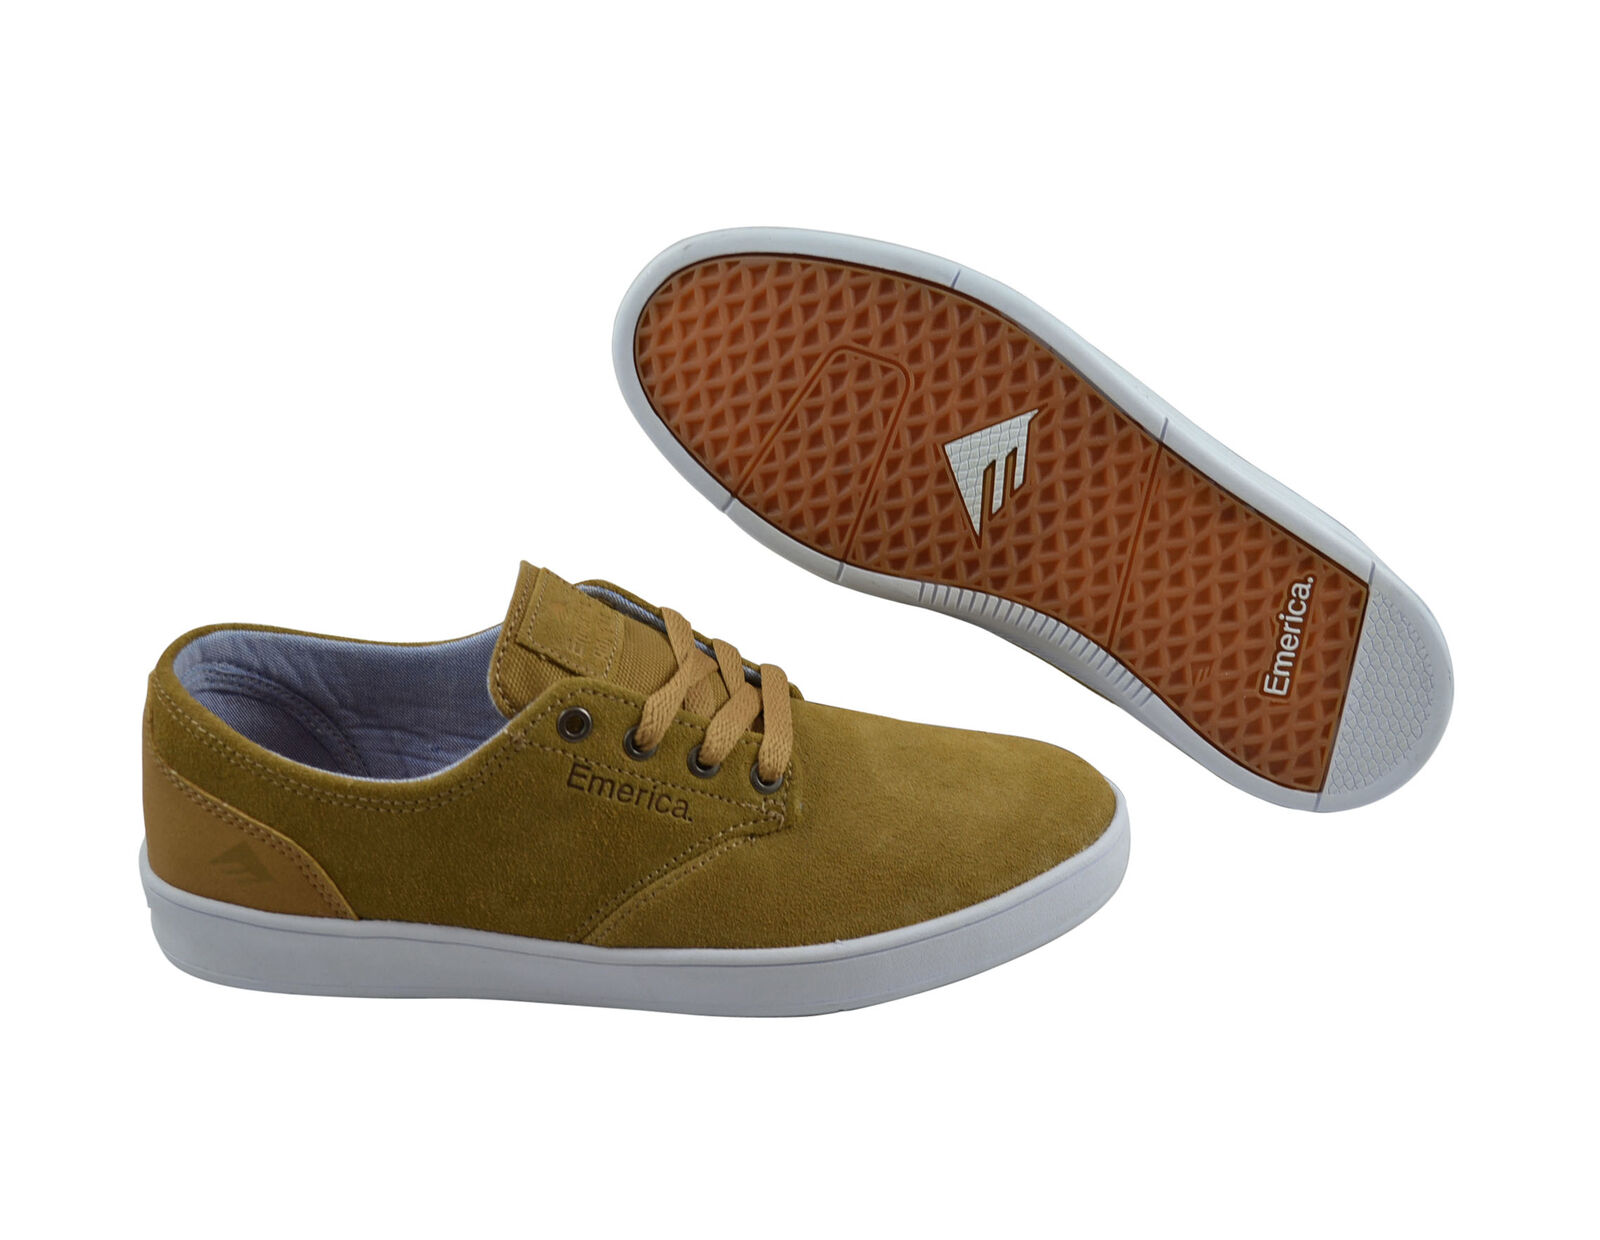 Emerica The Sneaker/Schuhe Romero Laced Braun/WEISS/Braun Skater Sneaker/Schuhe The braun f55aa7